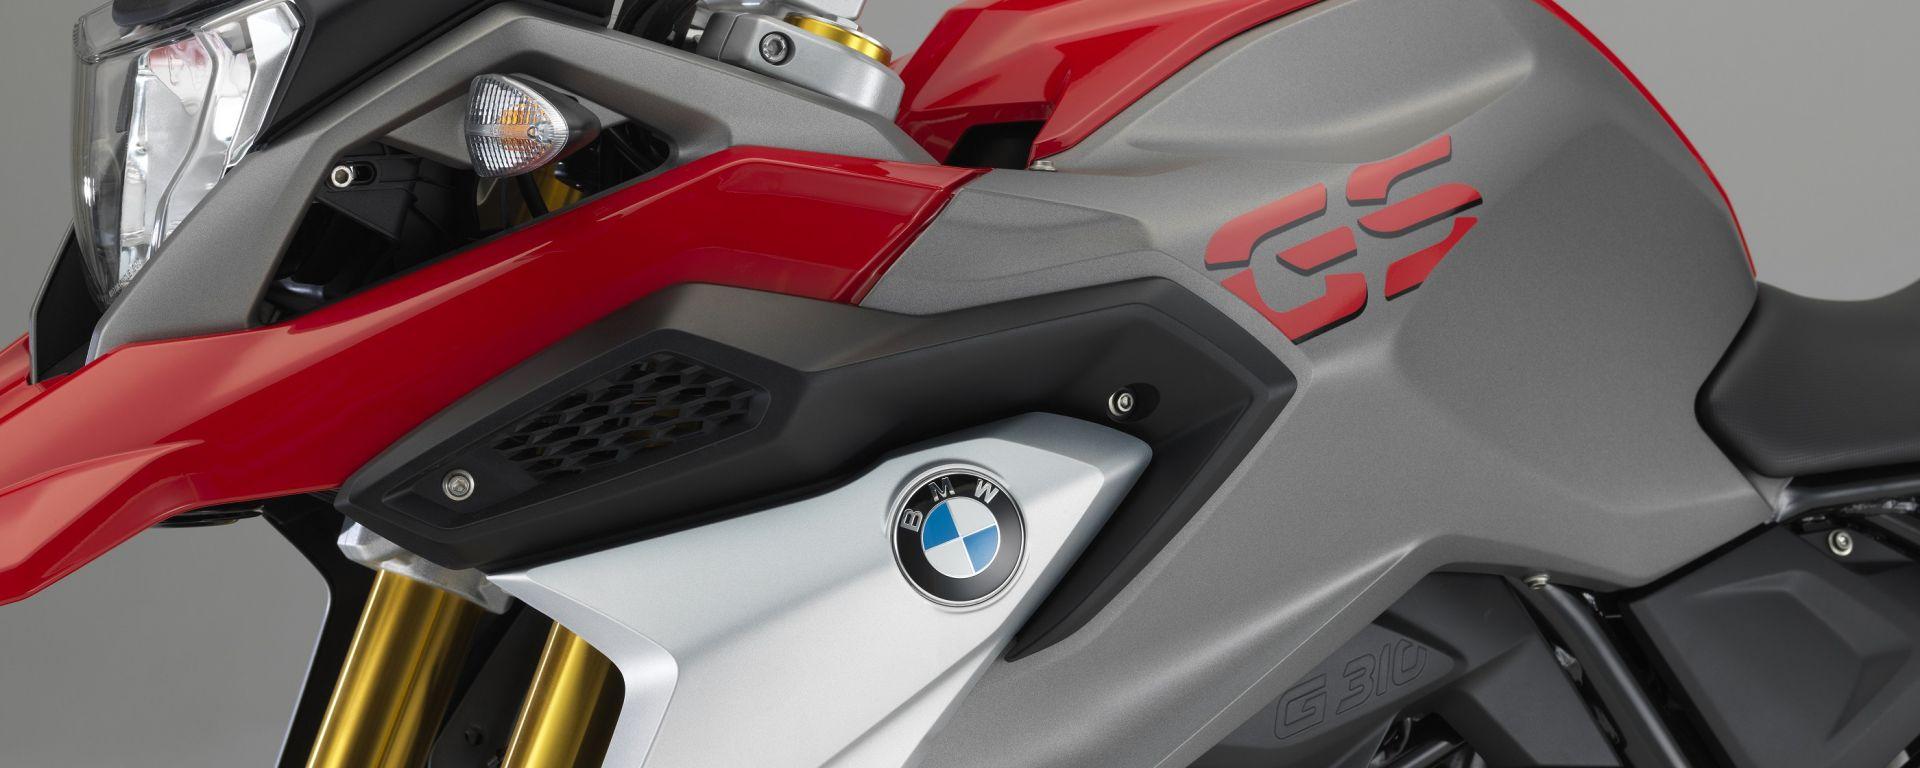 BMW G 310 GS, serbatoio